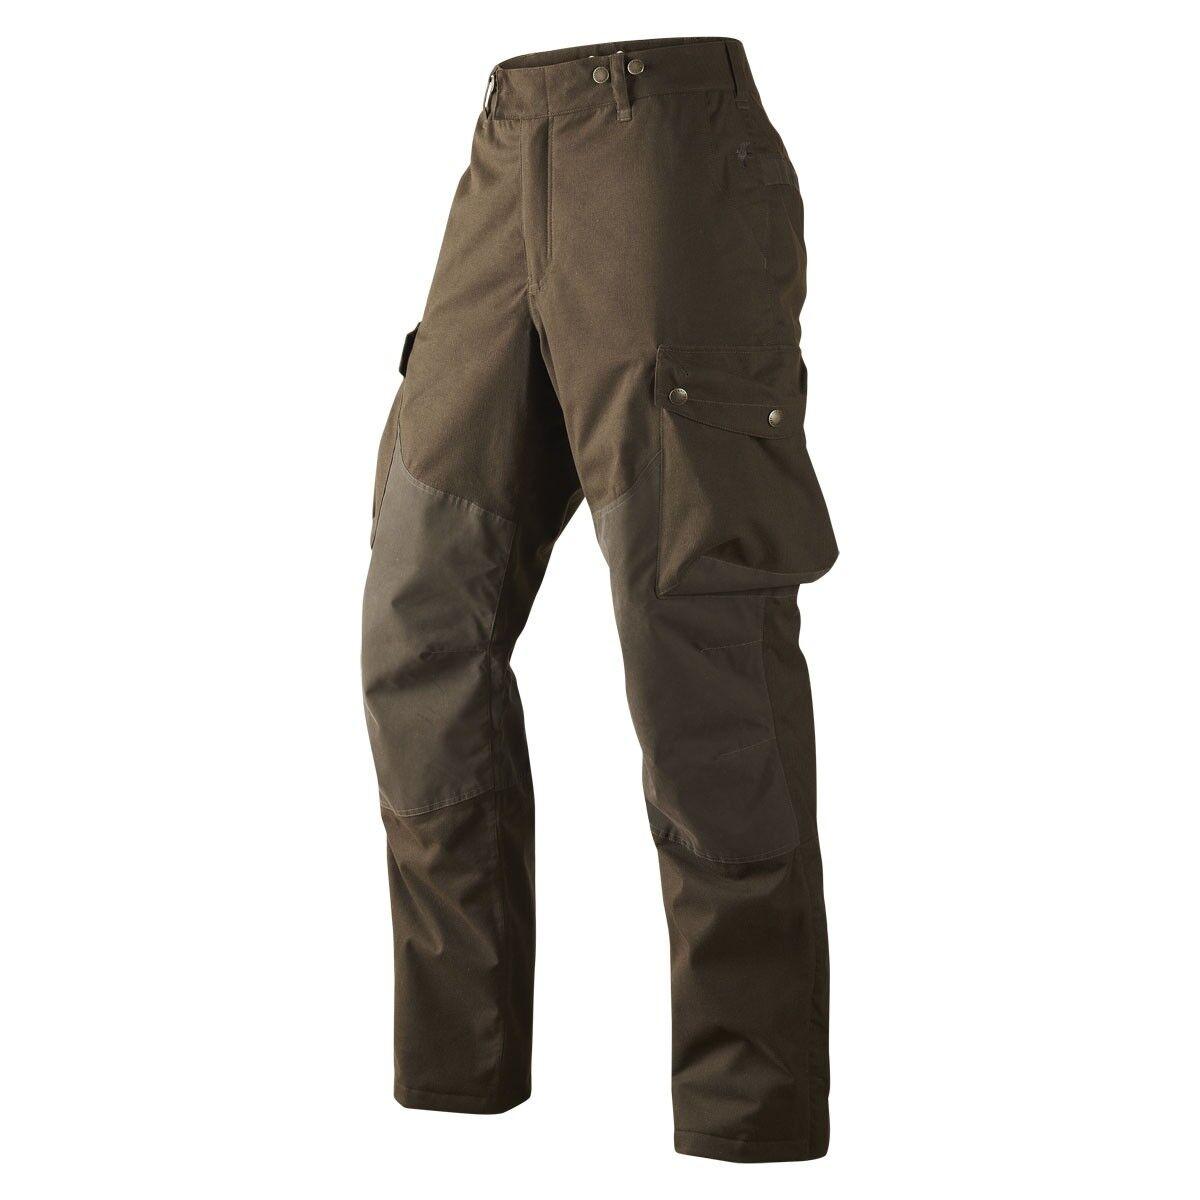 Seeland Sheldon Pantalones Tamaño de UK Grande 36  Cintura Fauno Marrón